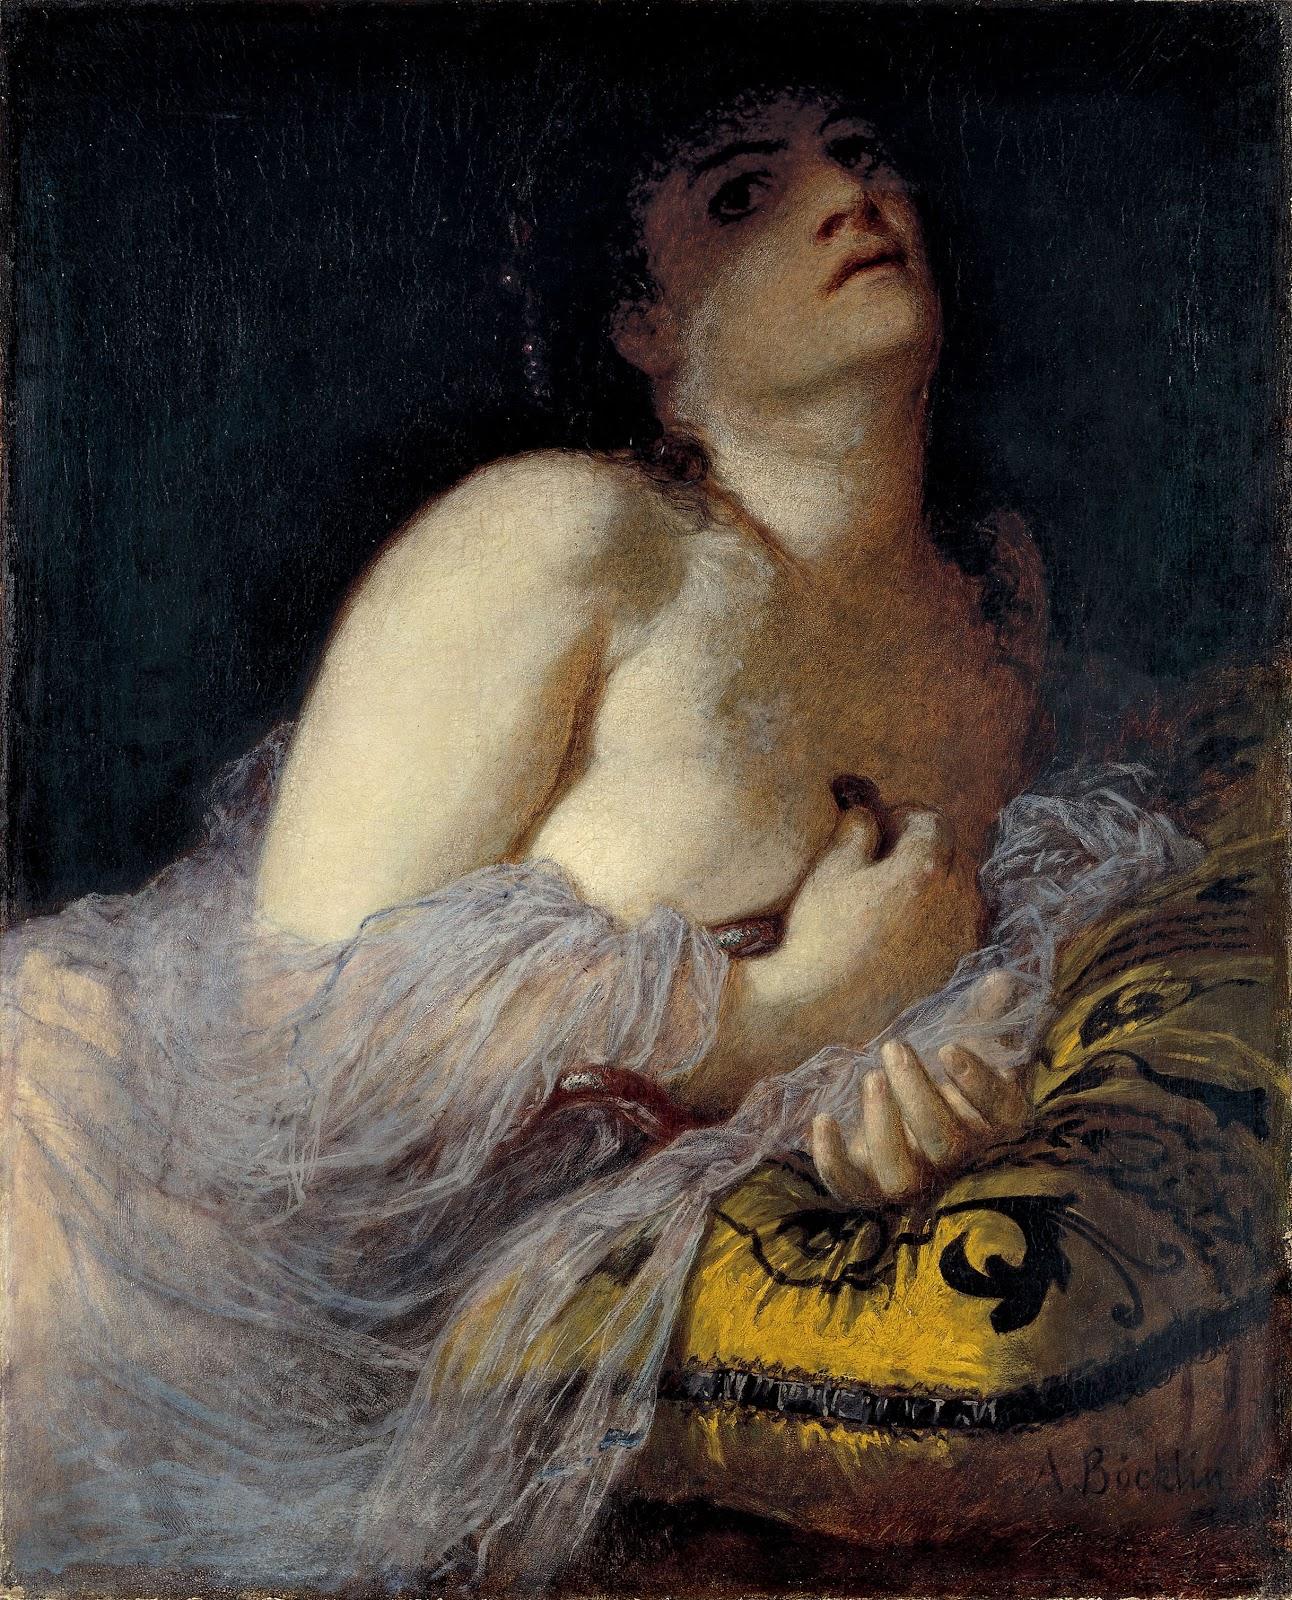 Arnold    C  cklin     Cleopatra  morente   prima  versione  C